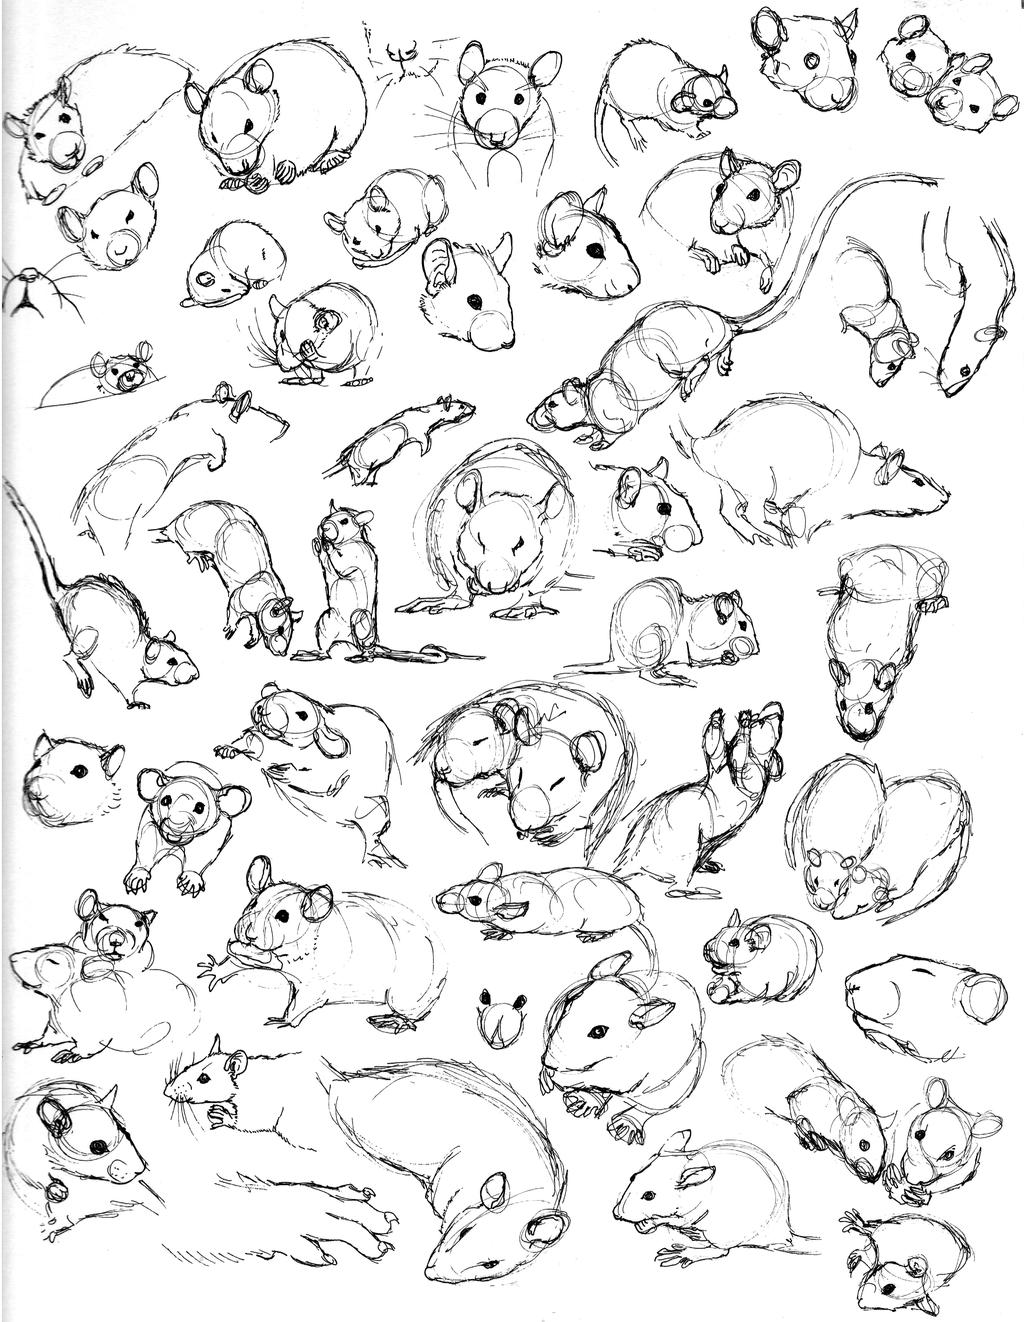 Drawn rat fancy 5 nEVEr mor Rat Sketch